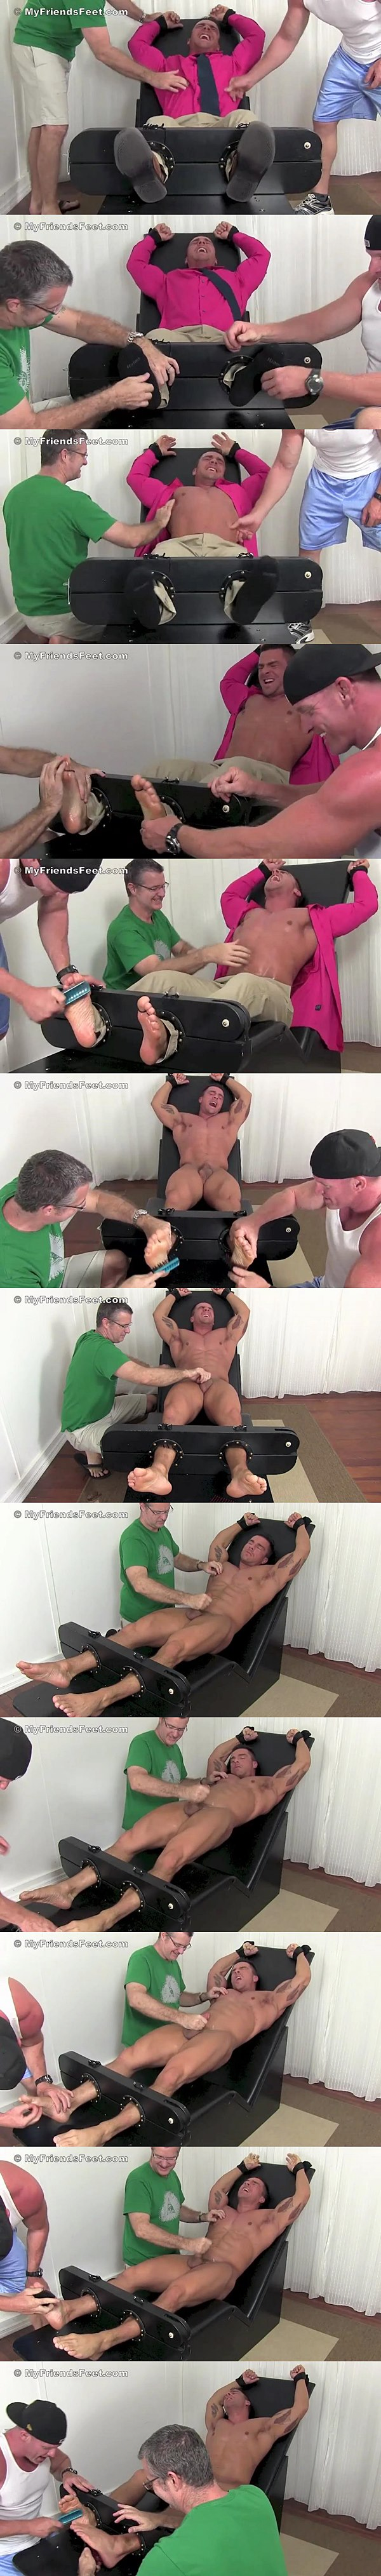 Macho straight muscle jock Braden Charron gets jerked-off & tickled at Myfriendsfeet 02